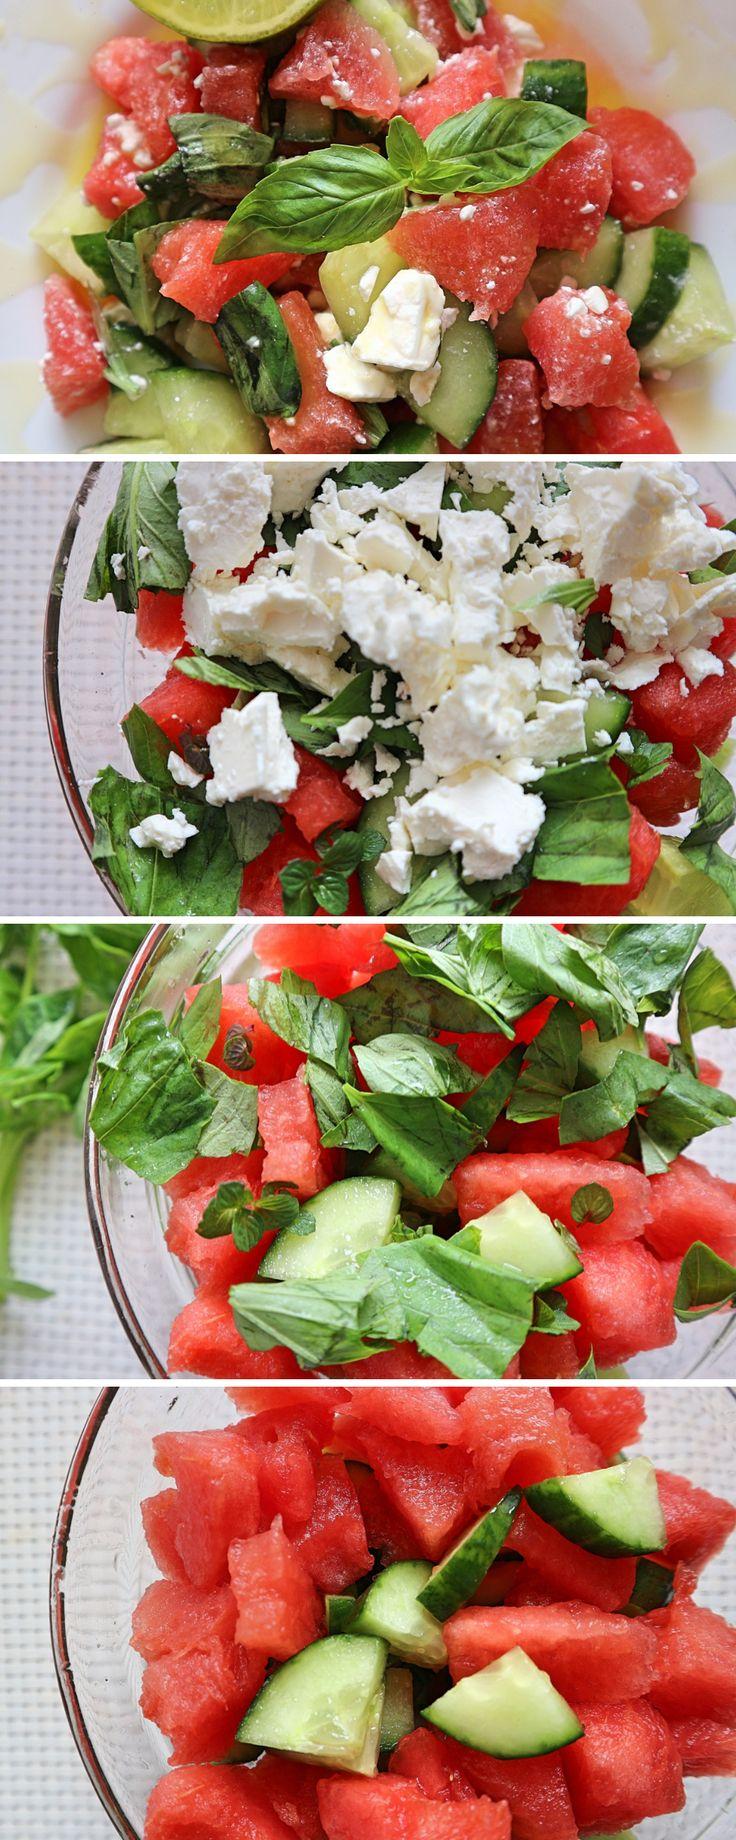 Wassermelonen-Gurken-Salat mit Feta & Honig-Limetten-Sauce – Rezept